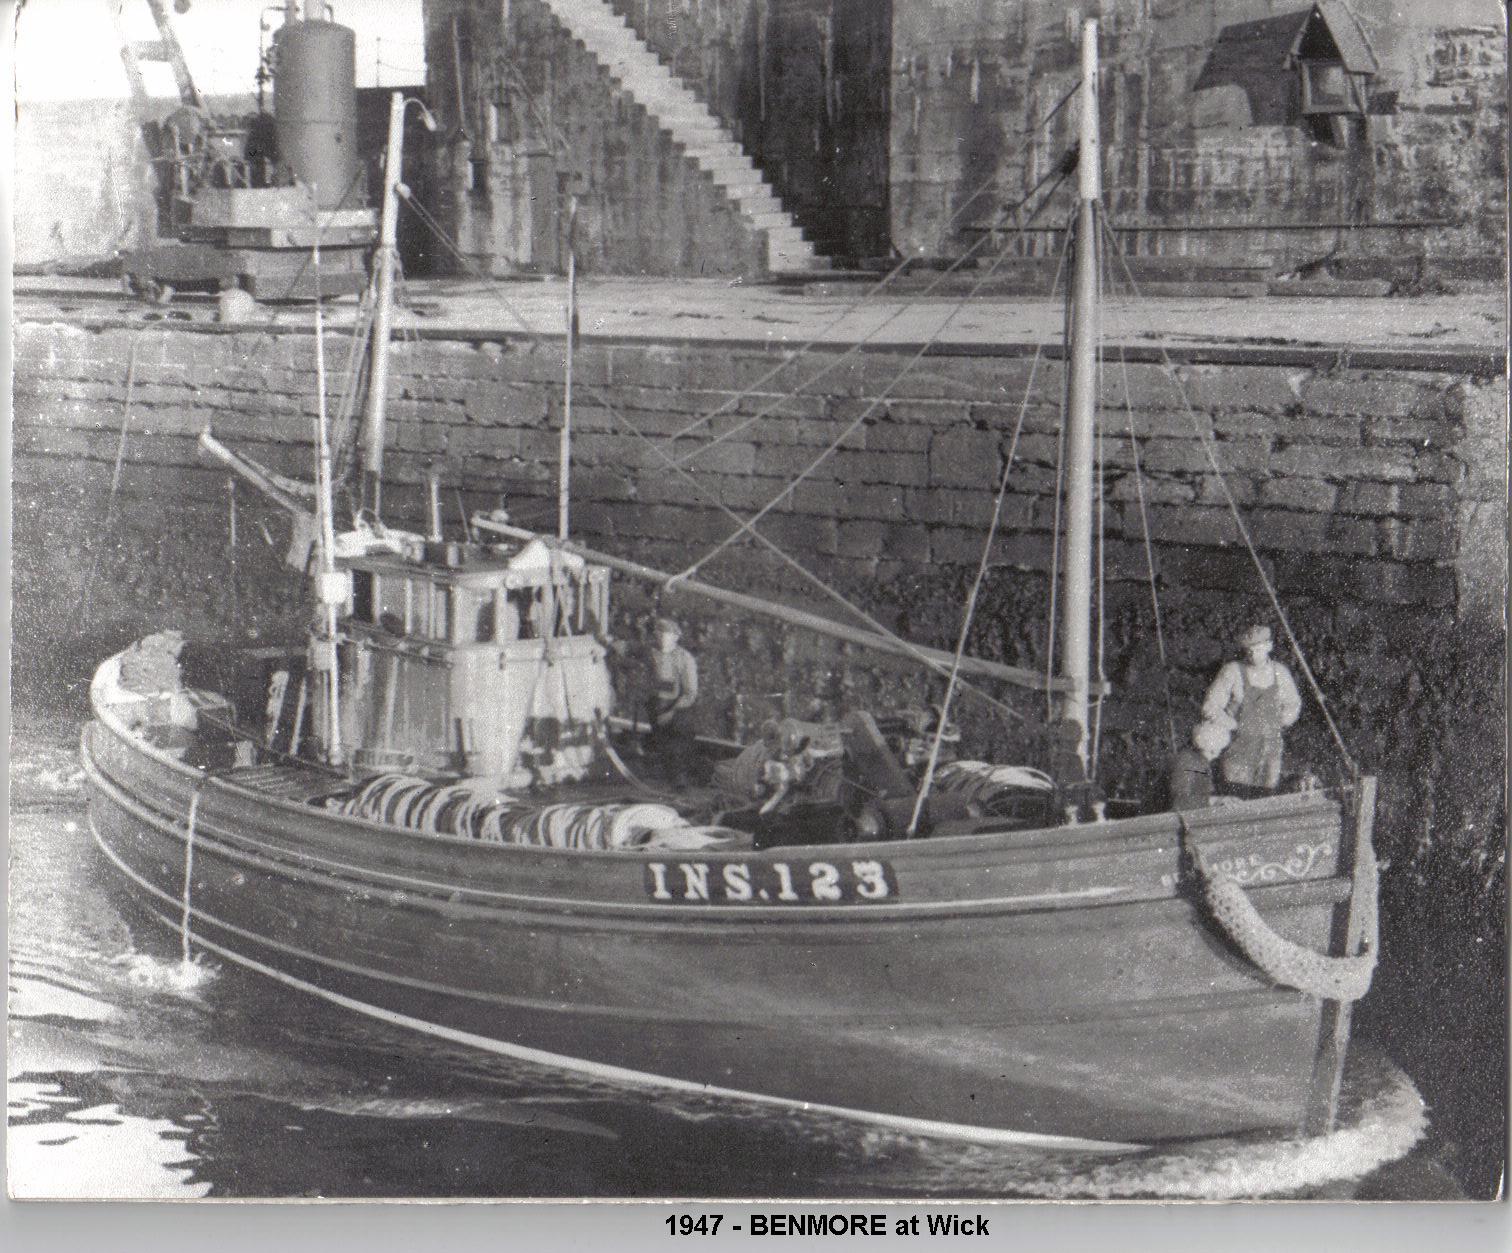 1947 - Benmore INS 123 @ Wick